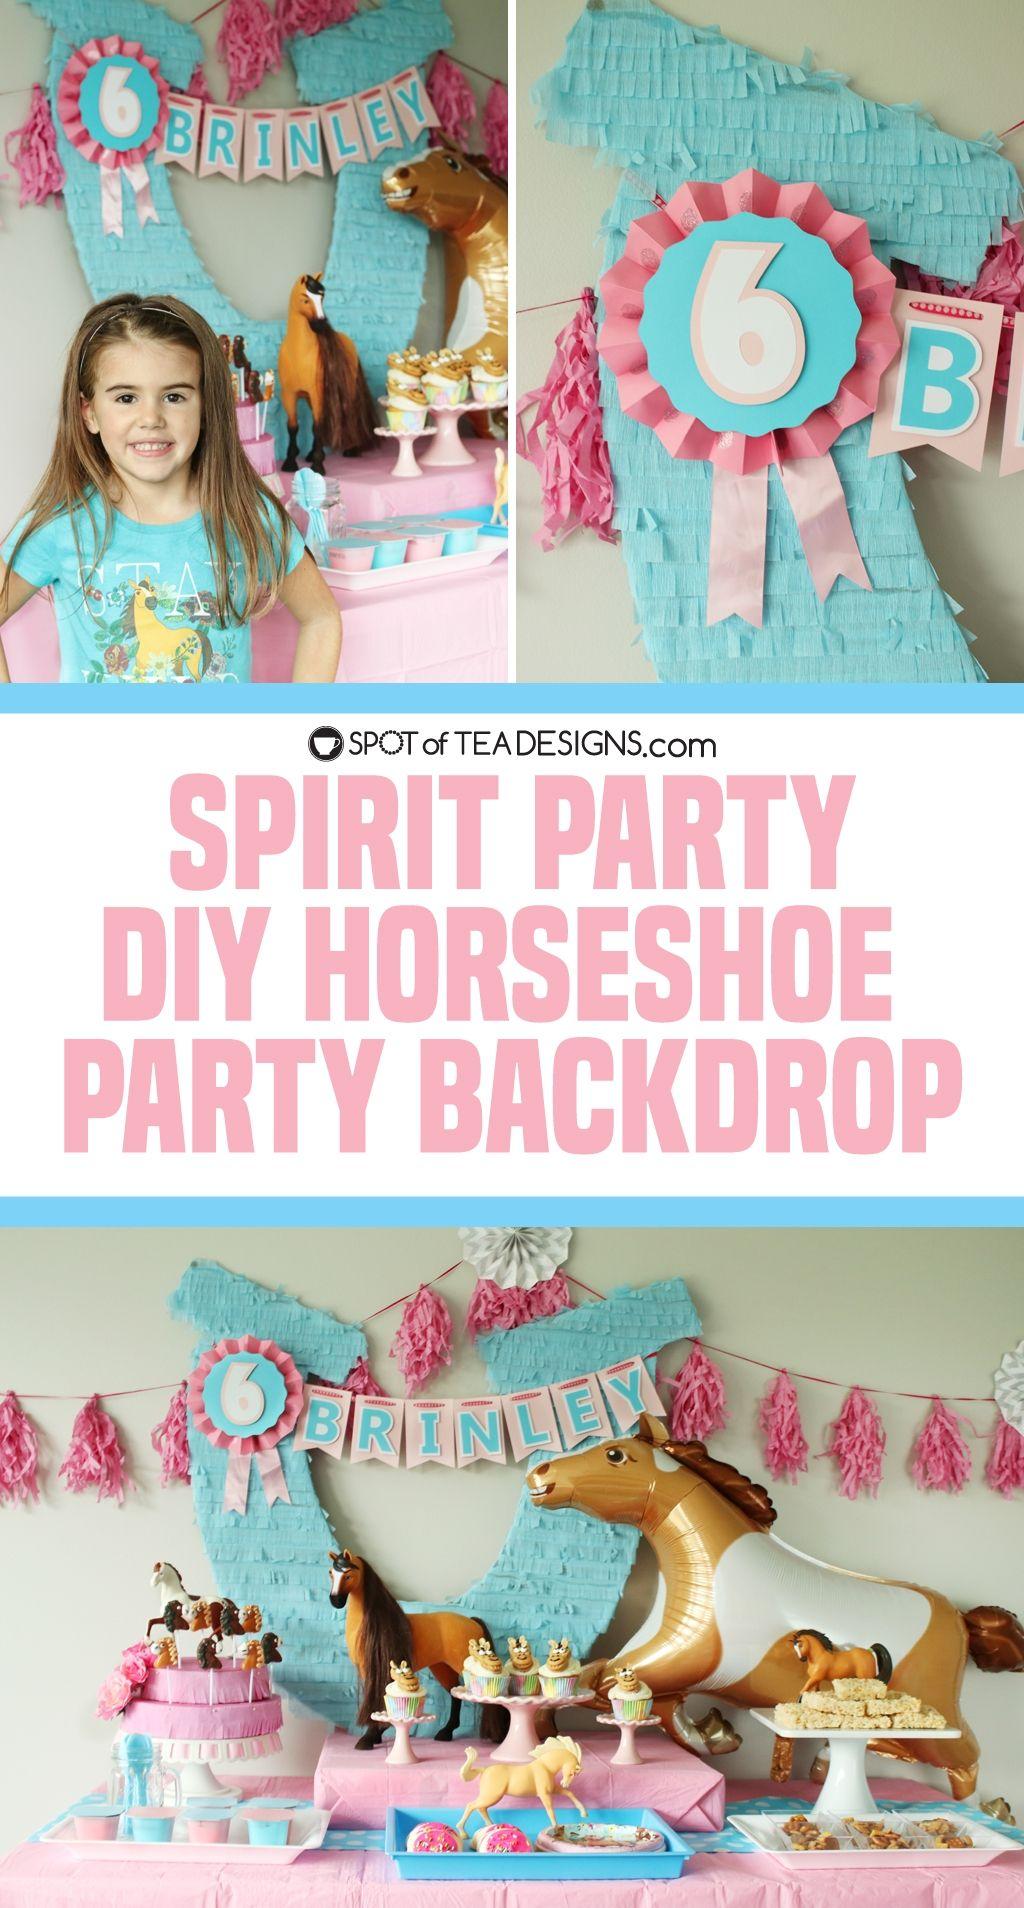 Spirit Party Backdrops For Parties Diy Party Tea Design